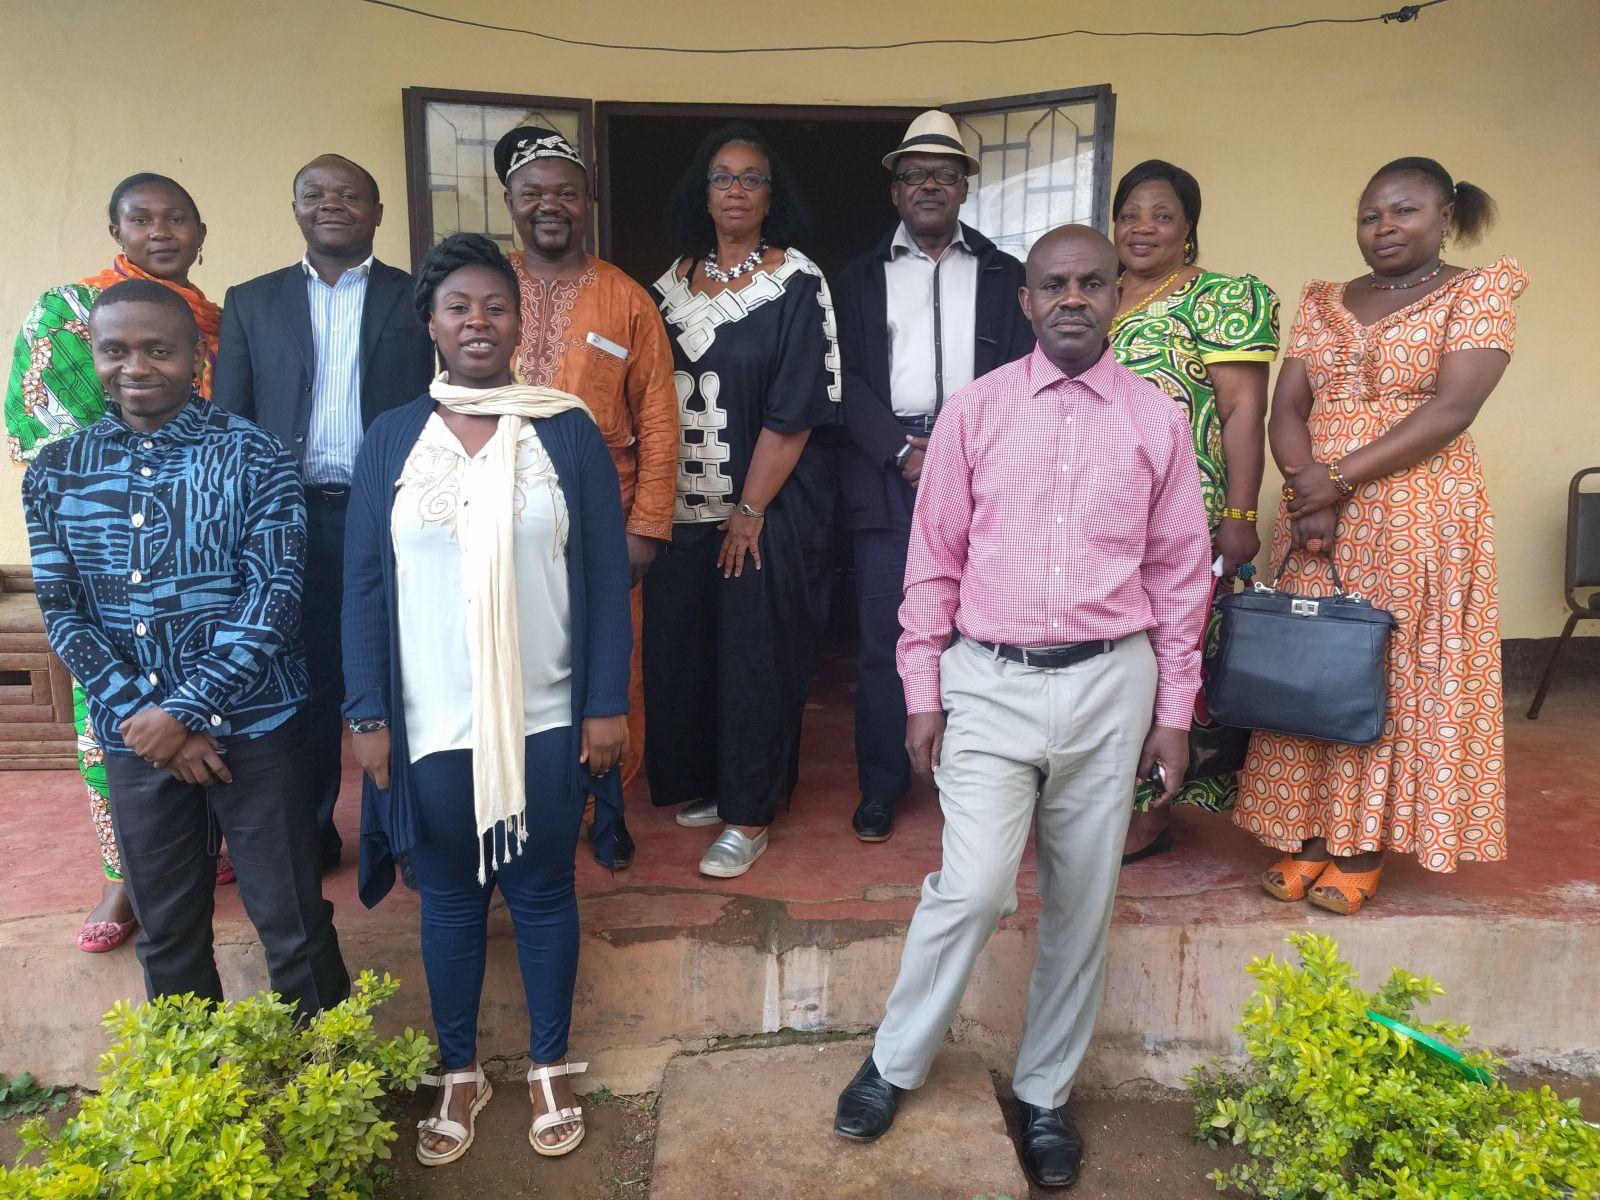 Taste Cameroon Community Enterprise CIC and Taste Cameroon Dschang